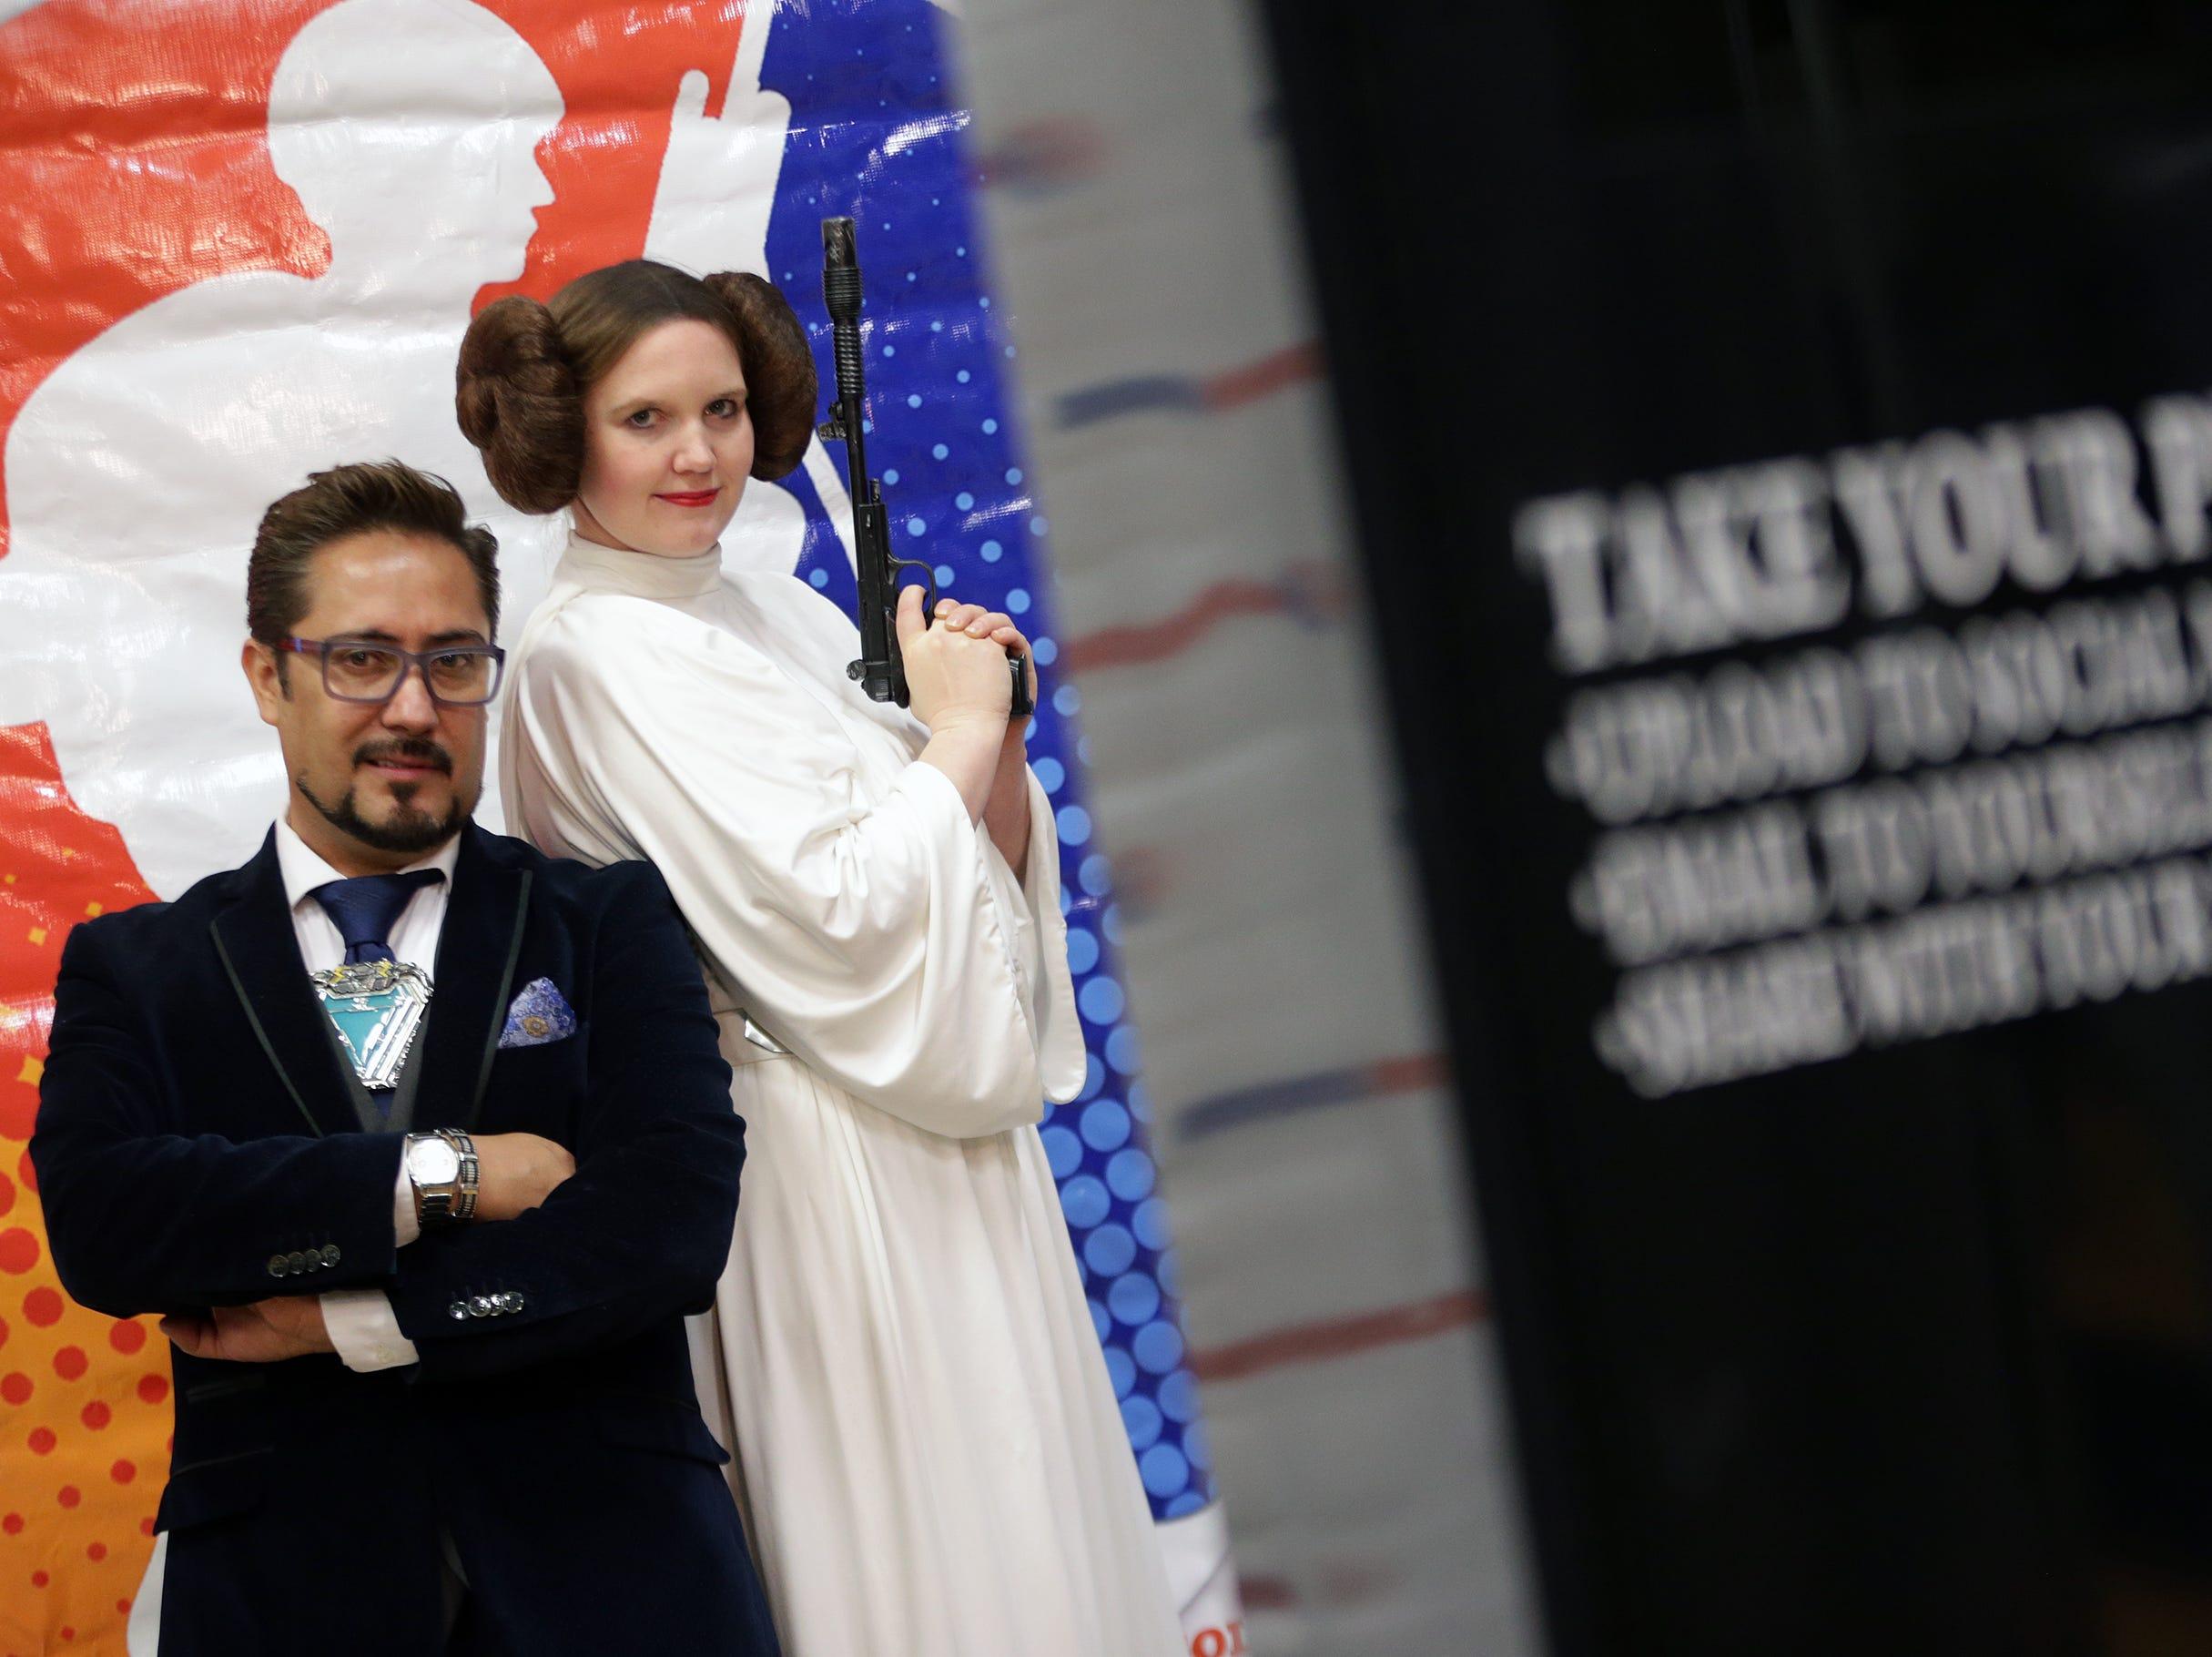 Iron Man takes a photo-booth photo with Princess Leia during the Coronado Thundercon Saturday at Coronado High School.